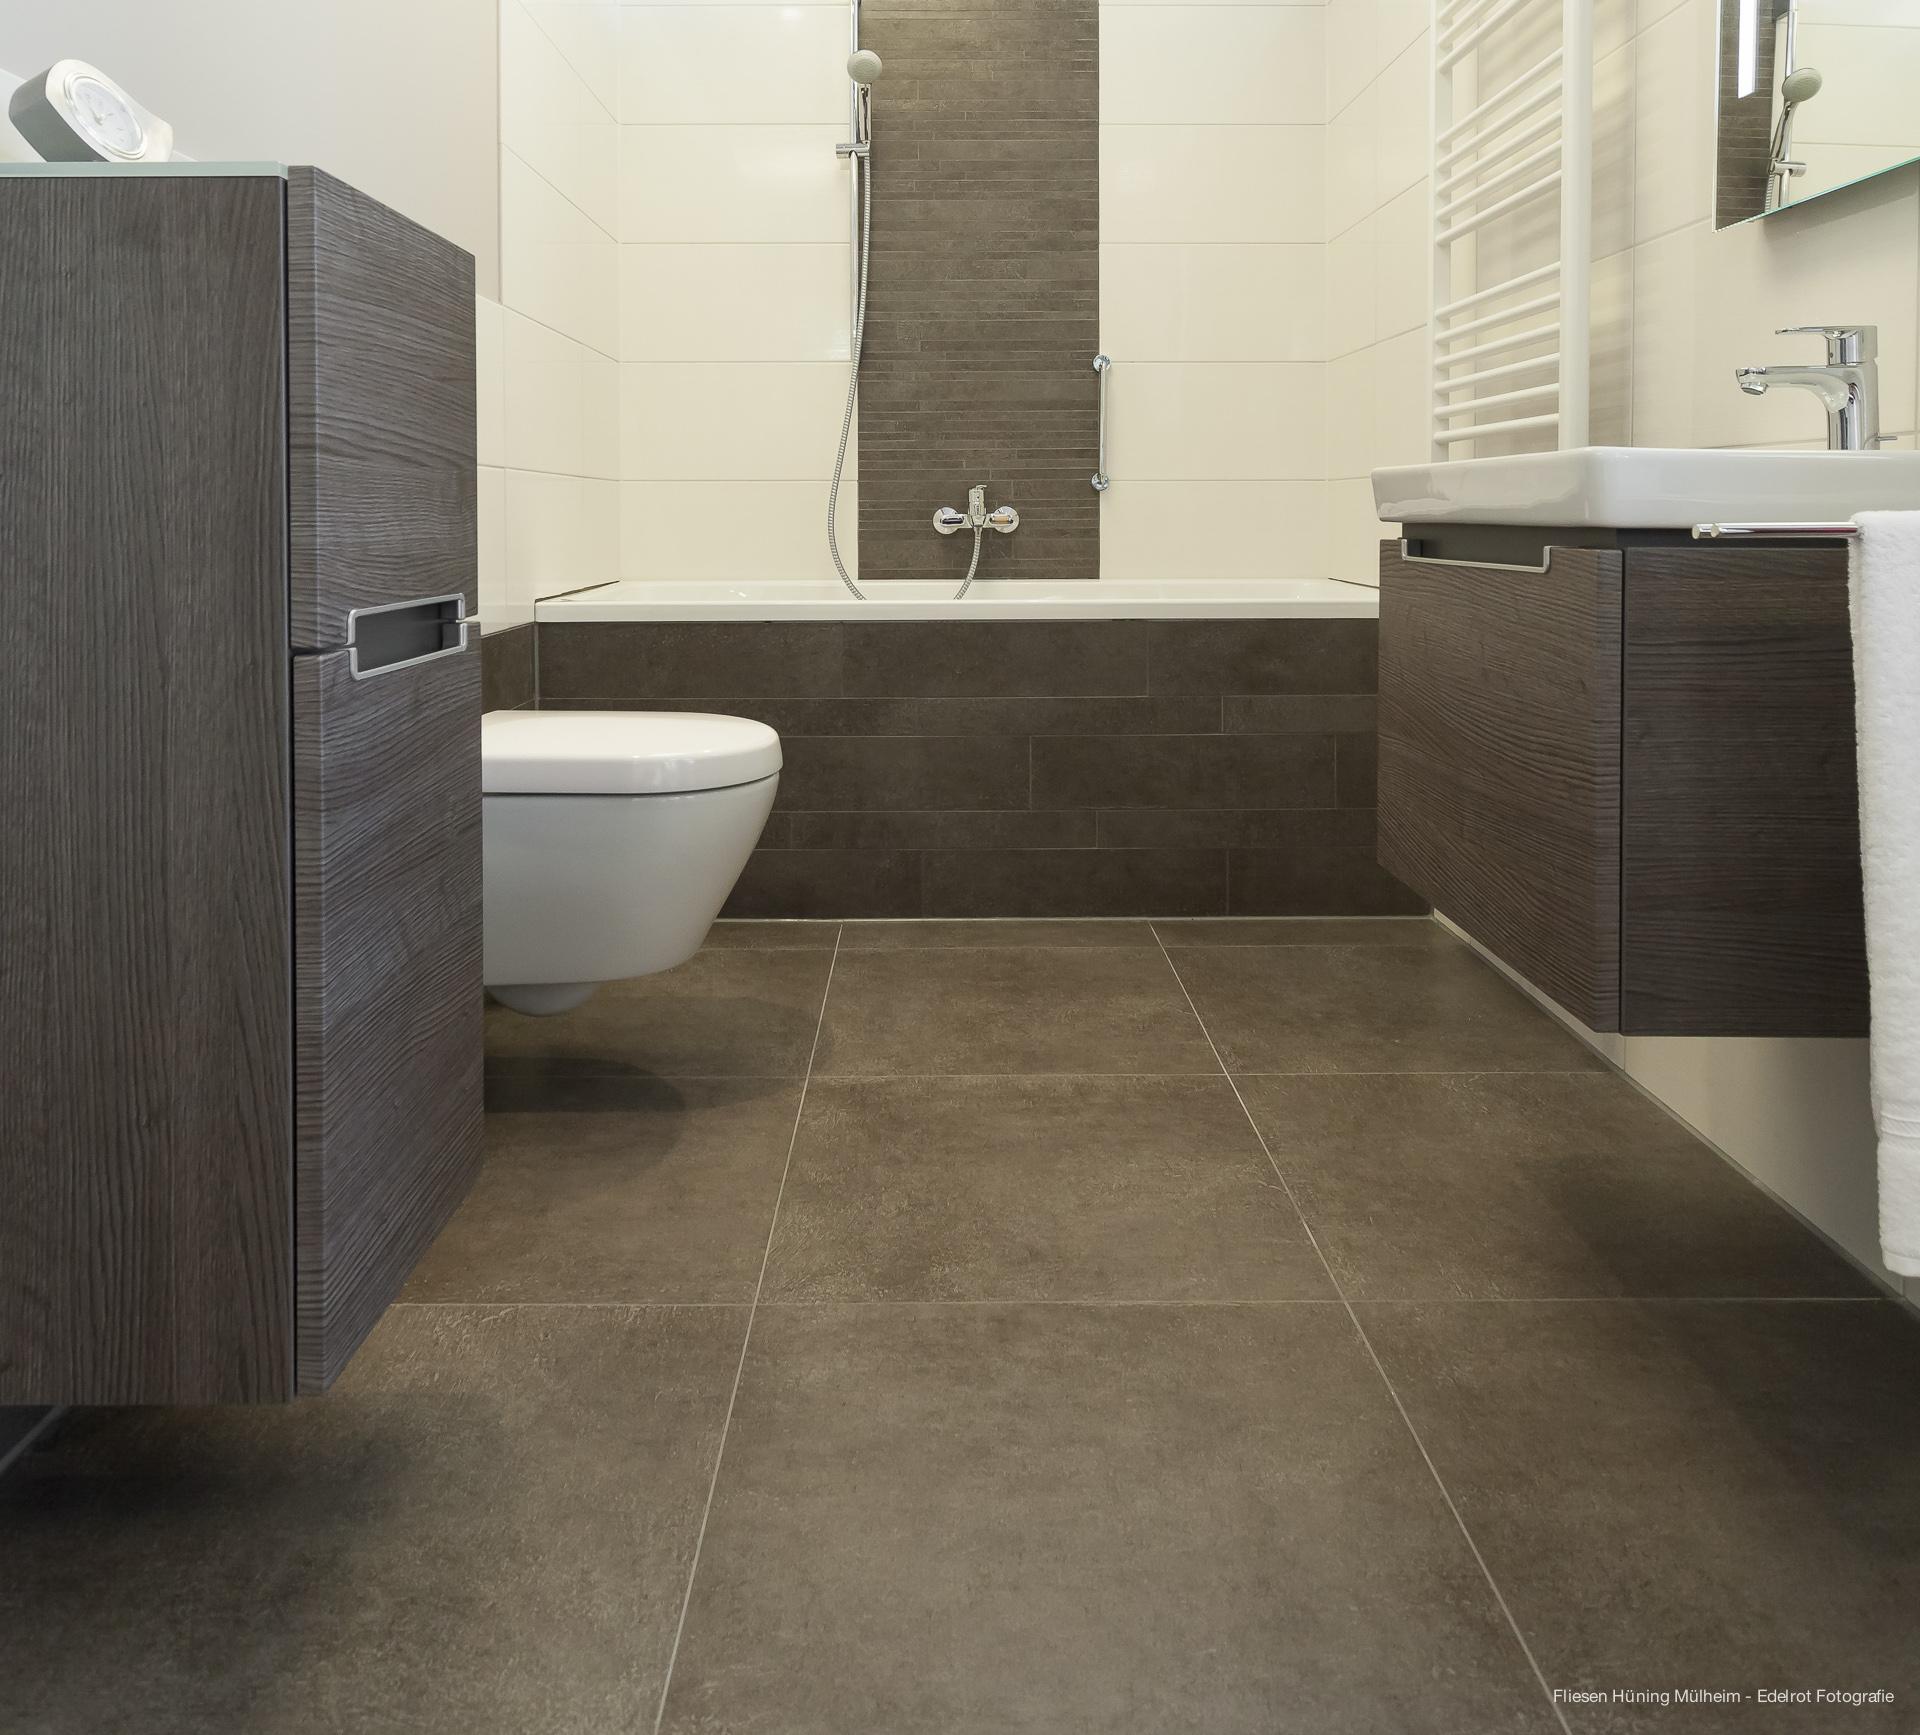 fliesen h ning m lheim edelrot fotografie. Black Bedroom Furniture Sets. Home Design Ideas